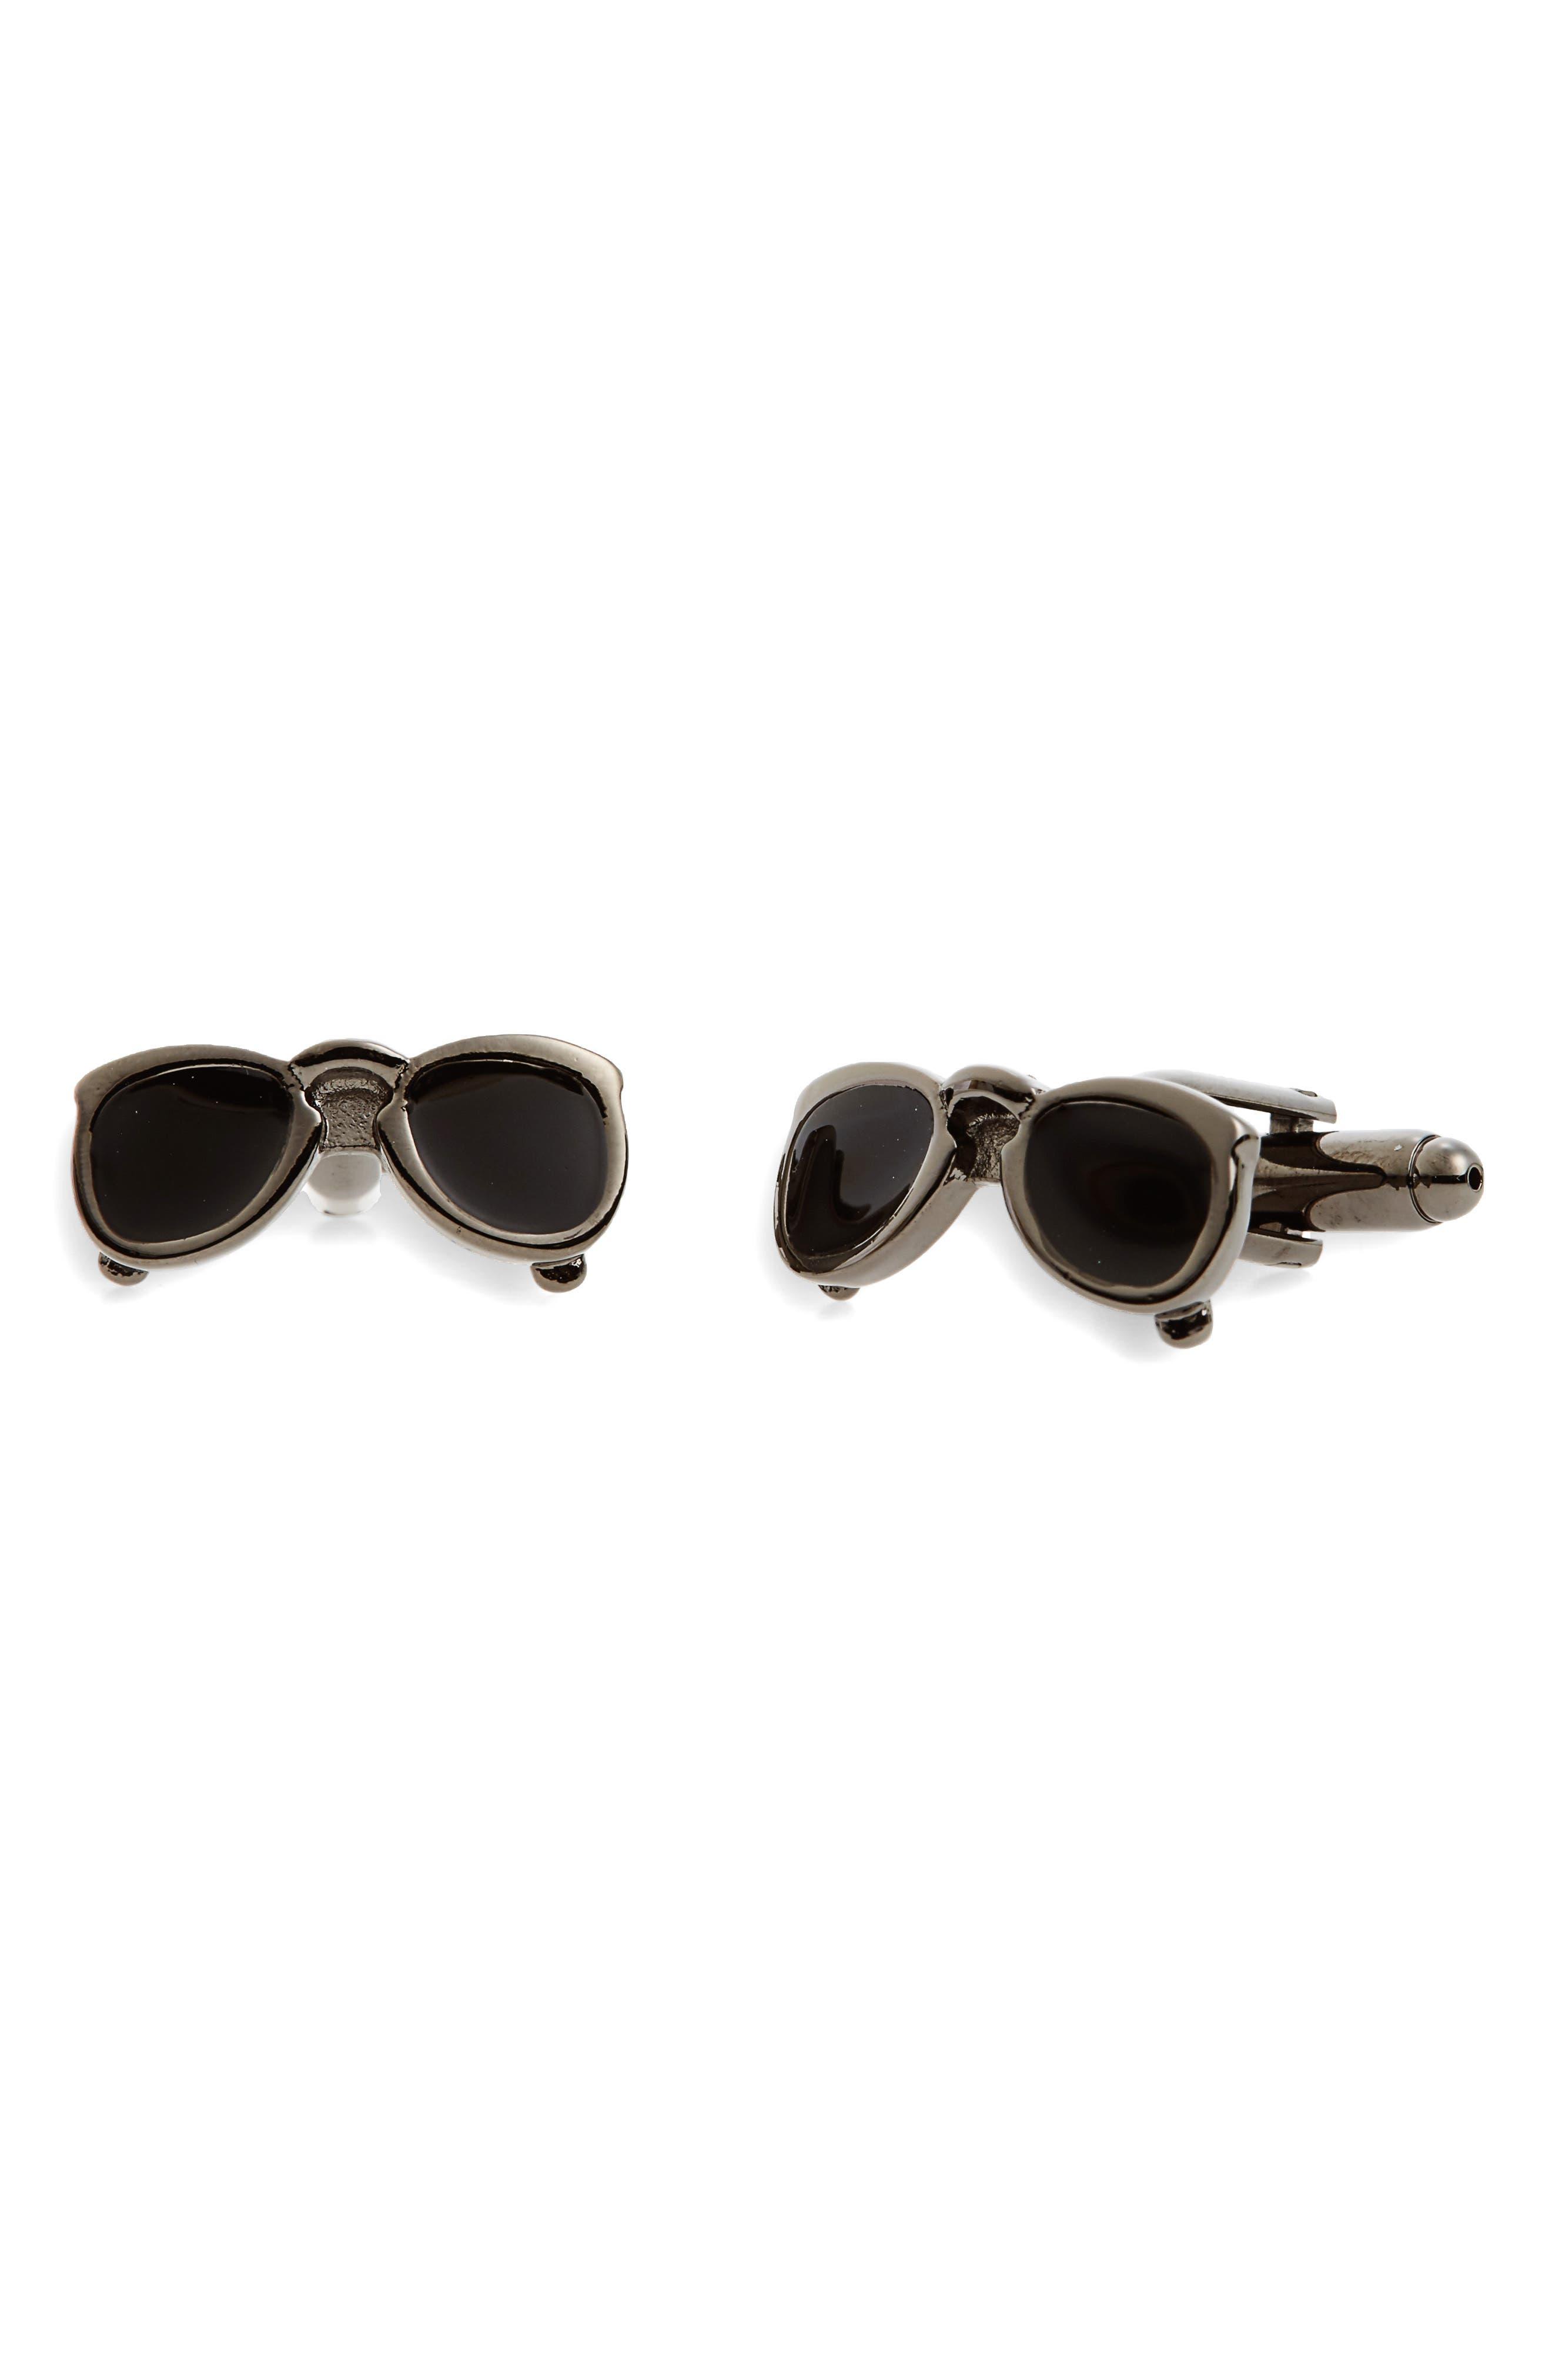 LINK UP Sunglasses Cuff Links